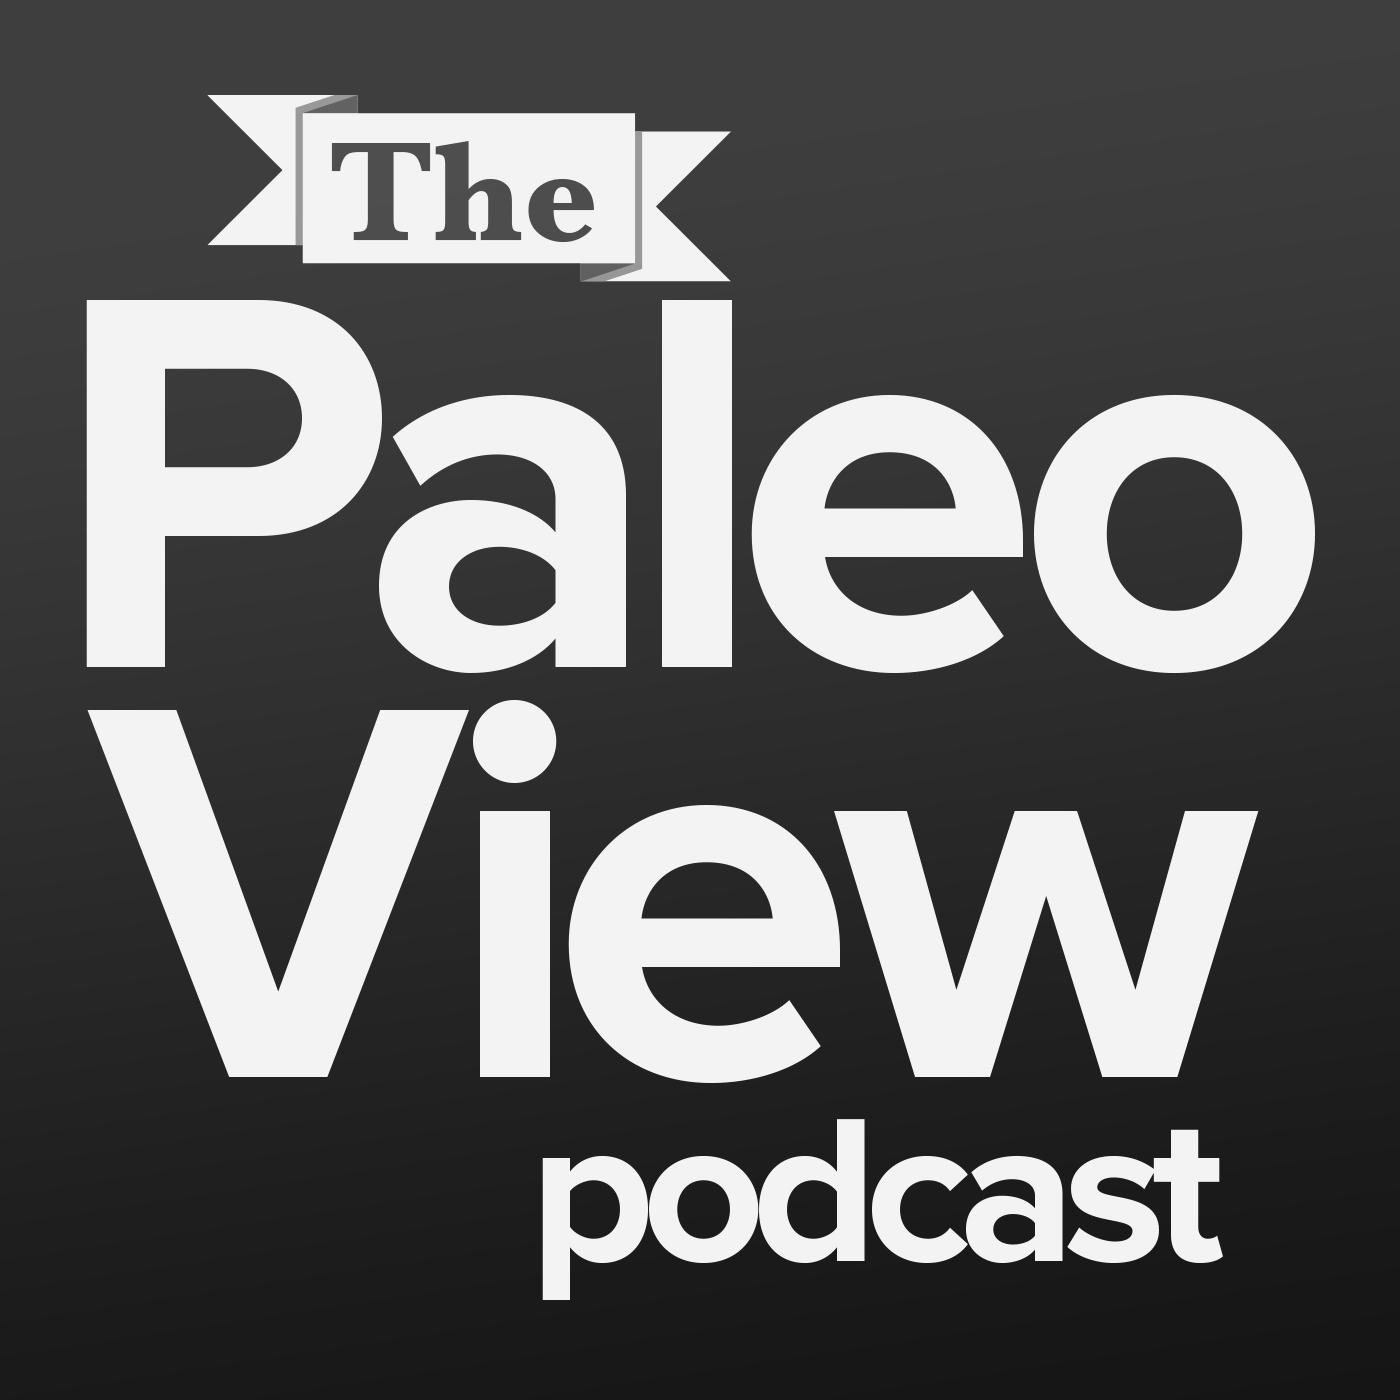 TPV Podcast, Episode 51: Integrating Paleo into School